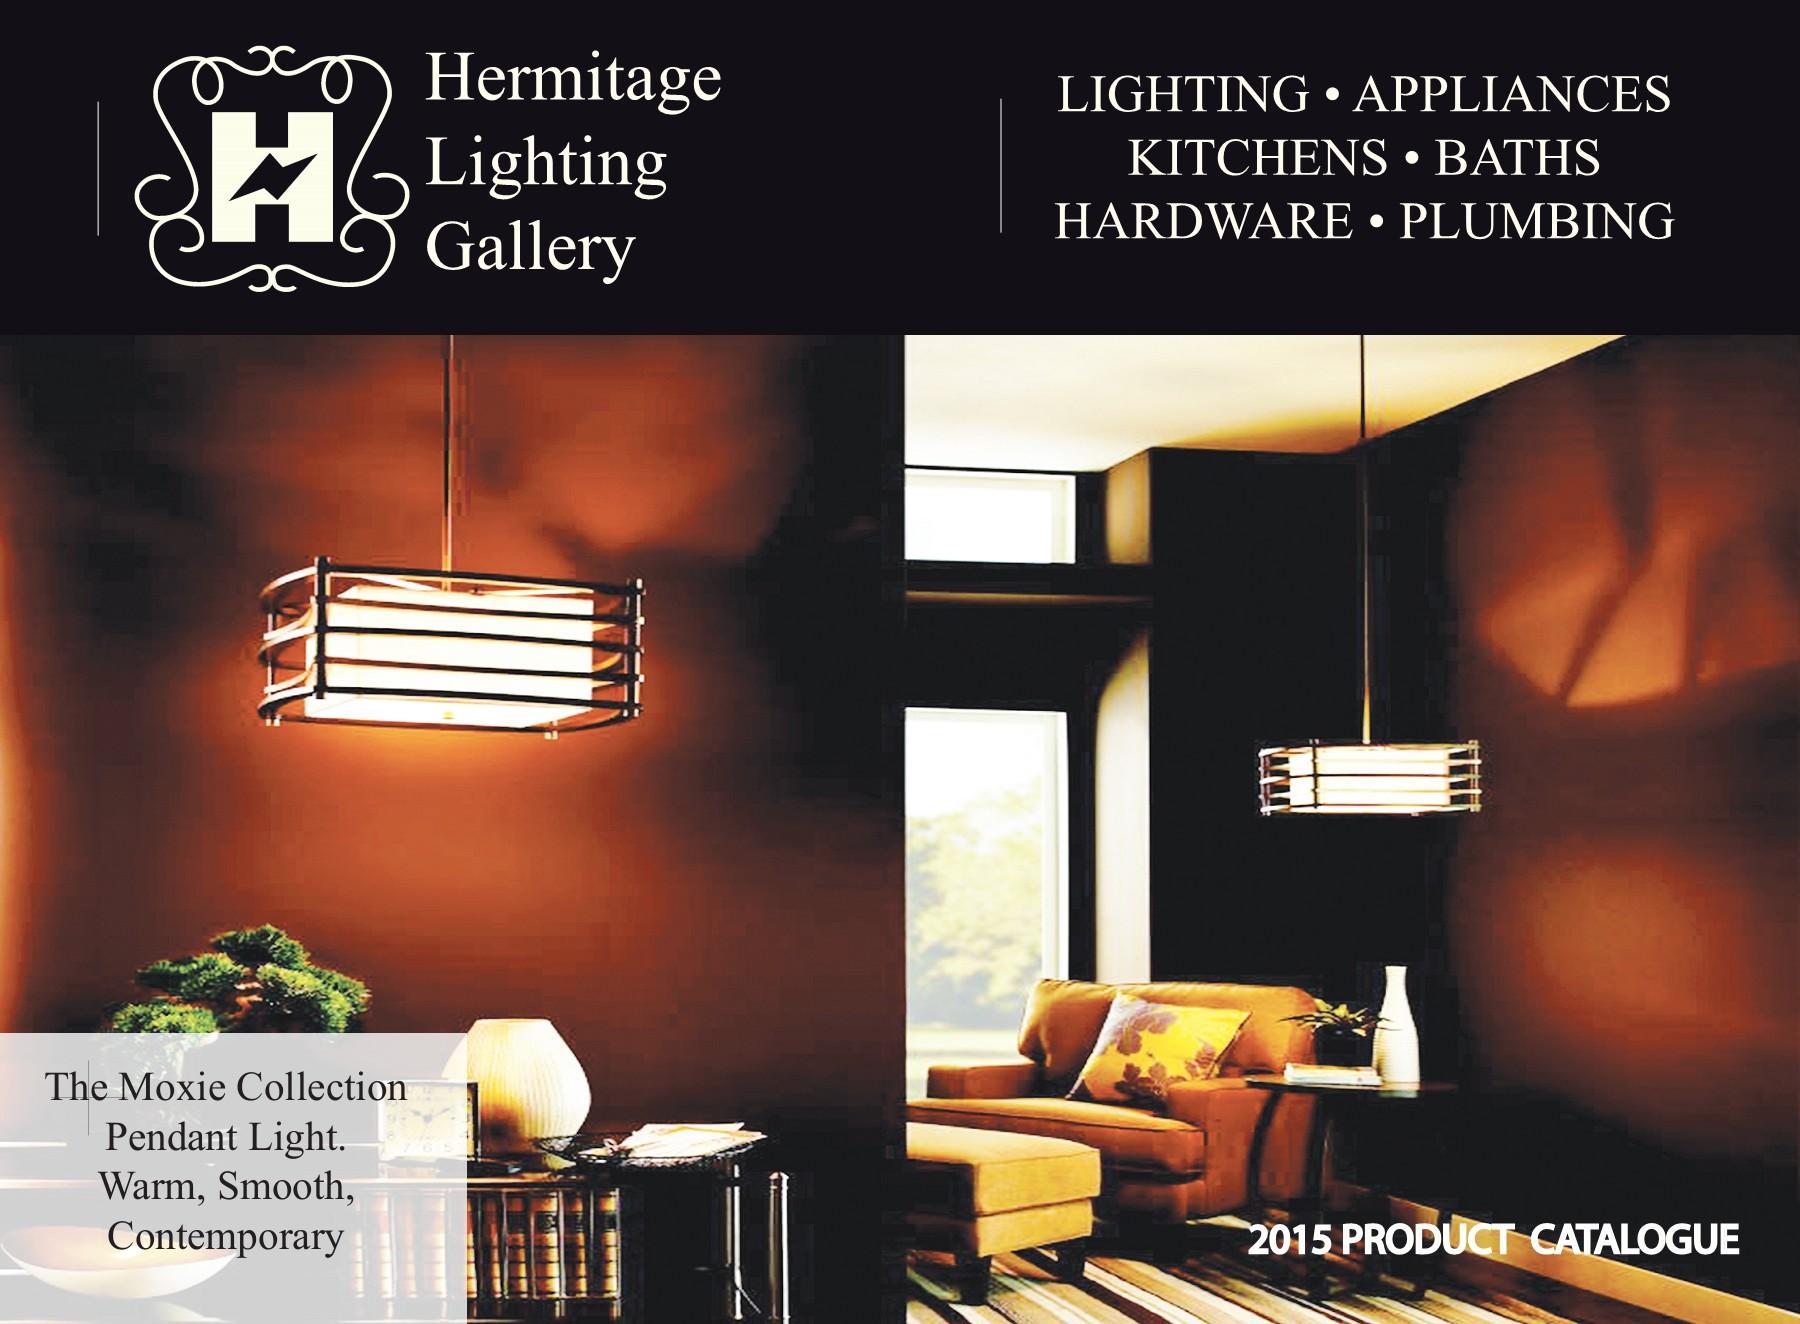 hermitage lighting gallery